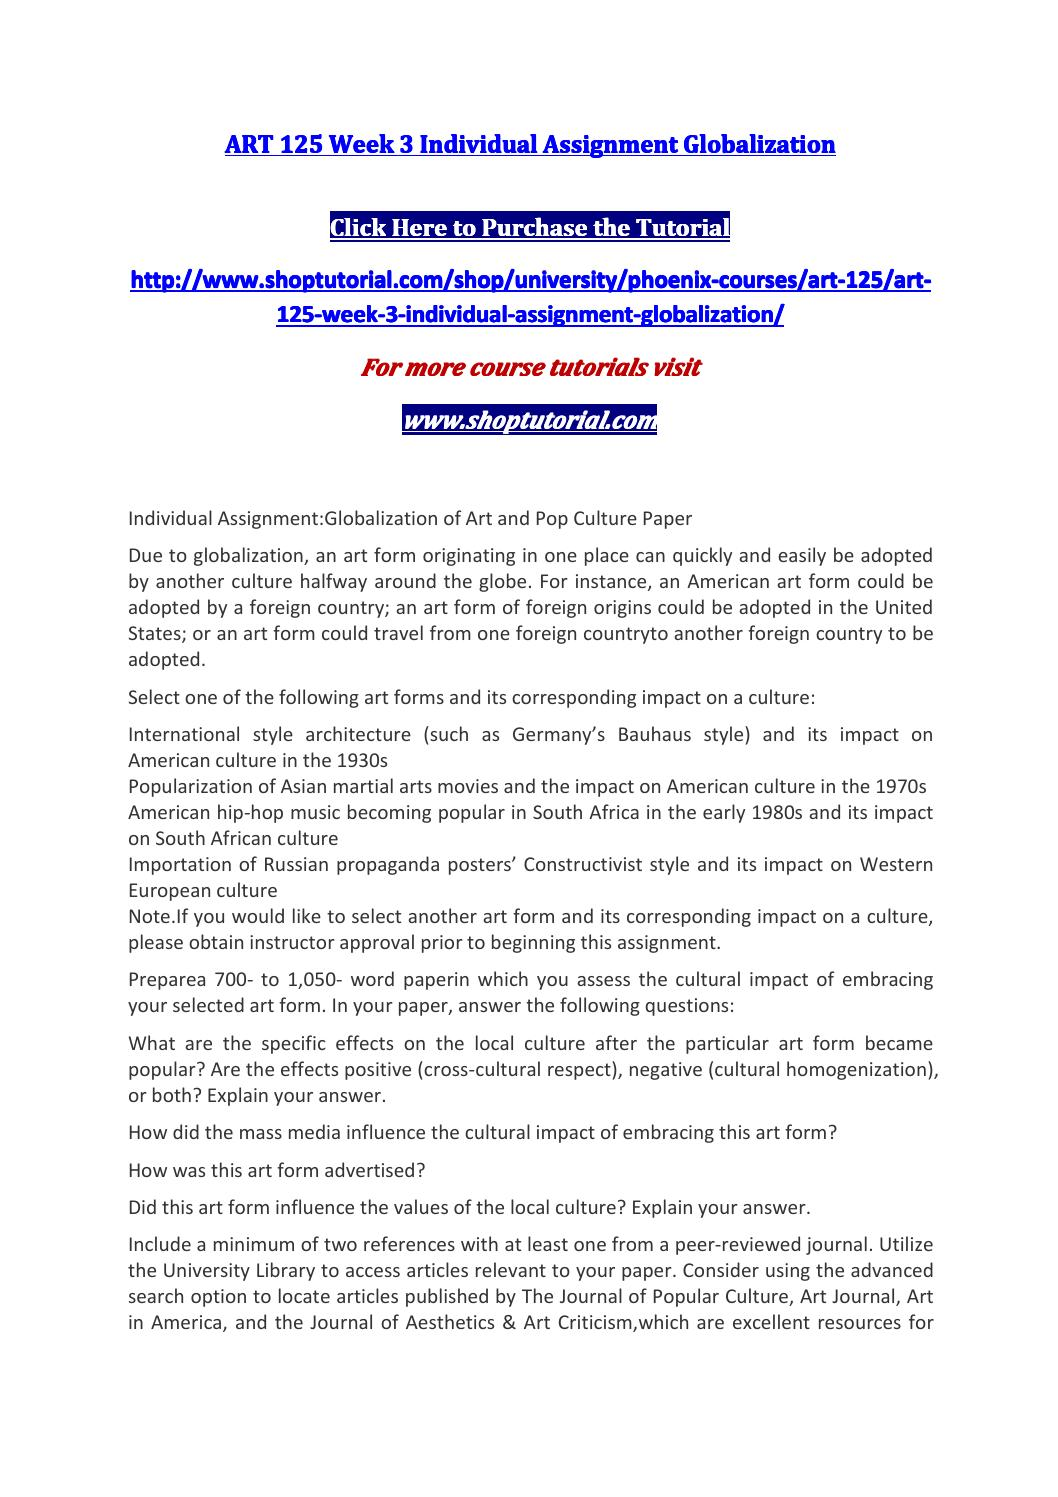 globalization articles